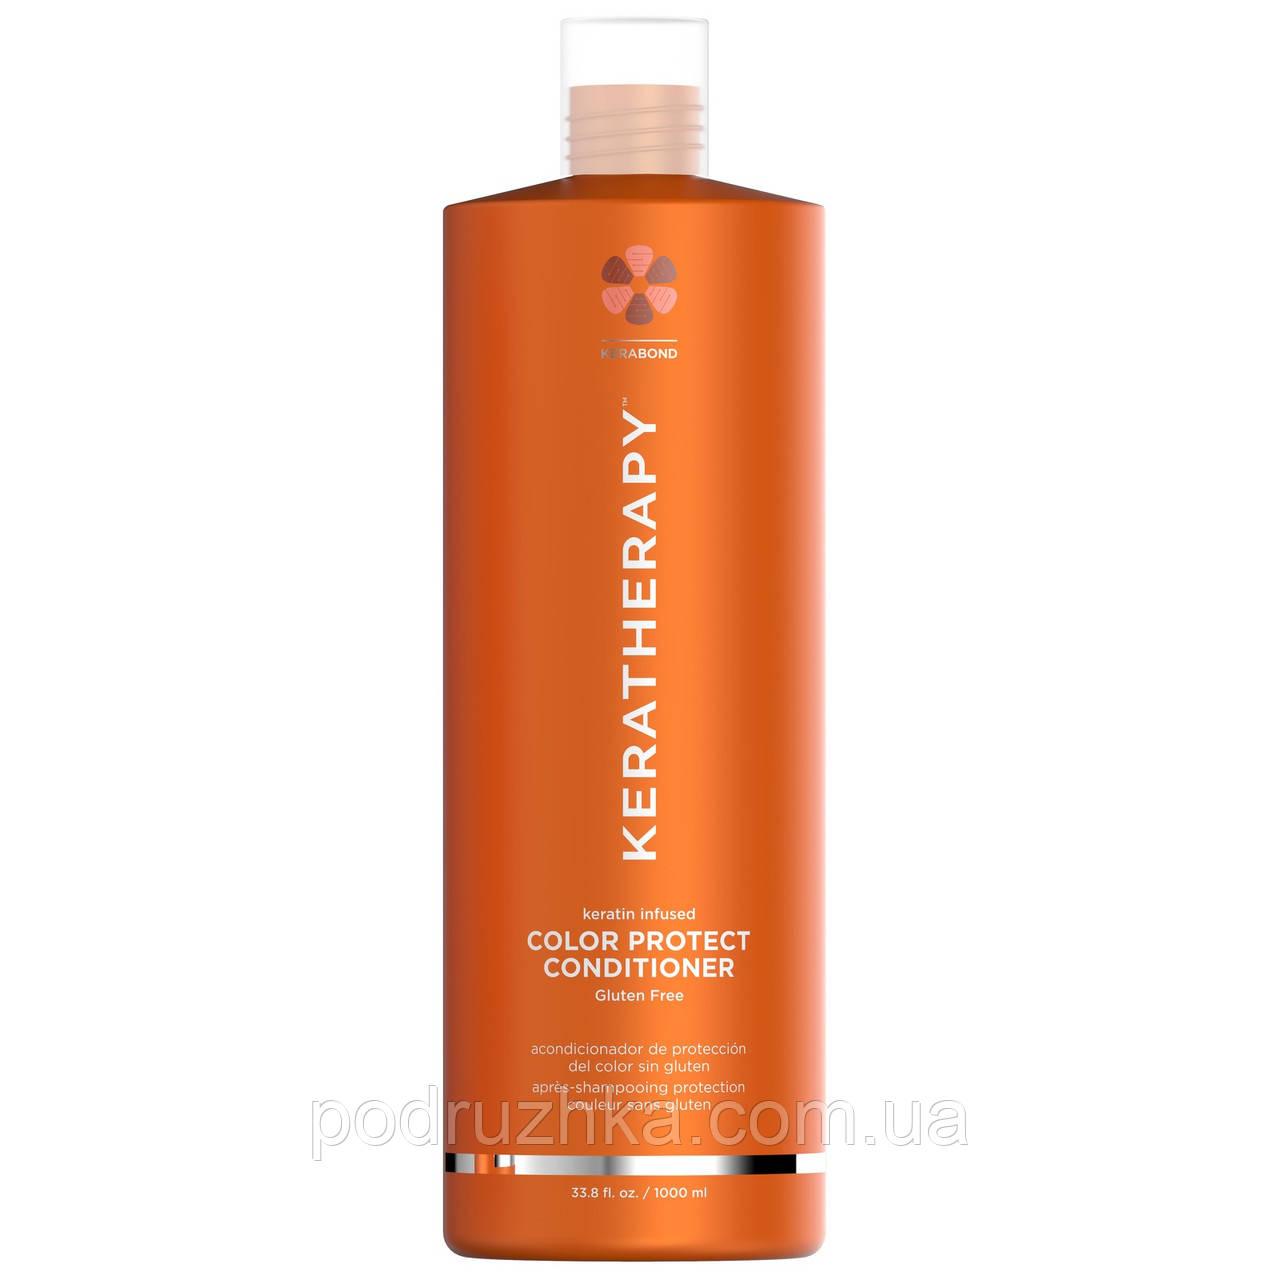 Безсульфатний кондиціонер Keratherapy Color Protect Conditioner 1000 ml